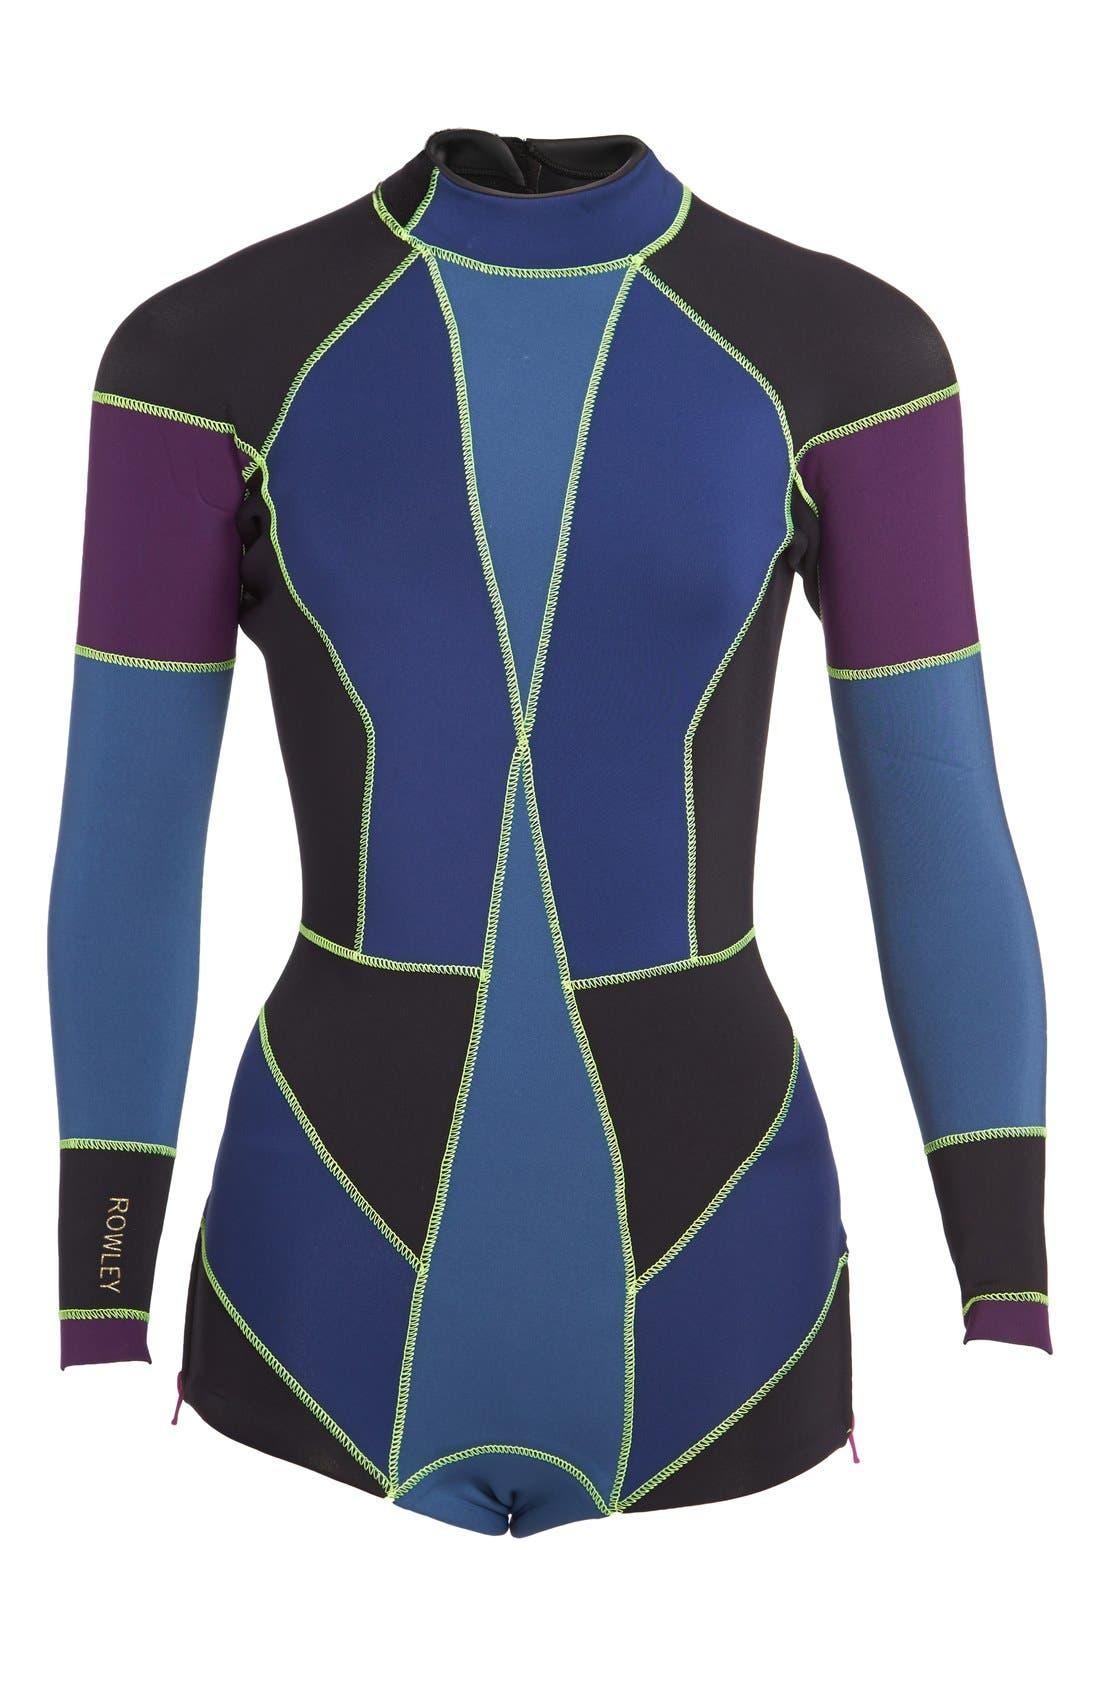 CYNTHIA ROWLEY Colorblock Wetsuit, Main, color, 410